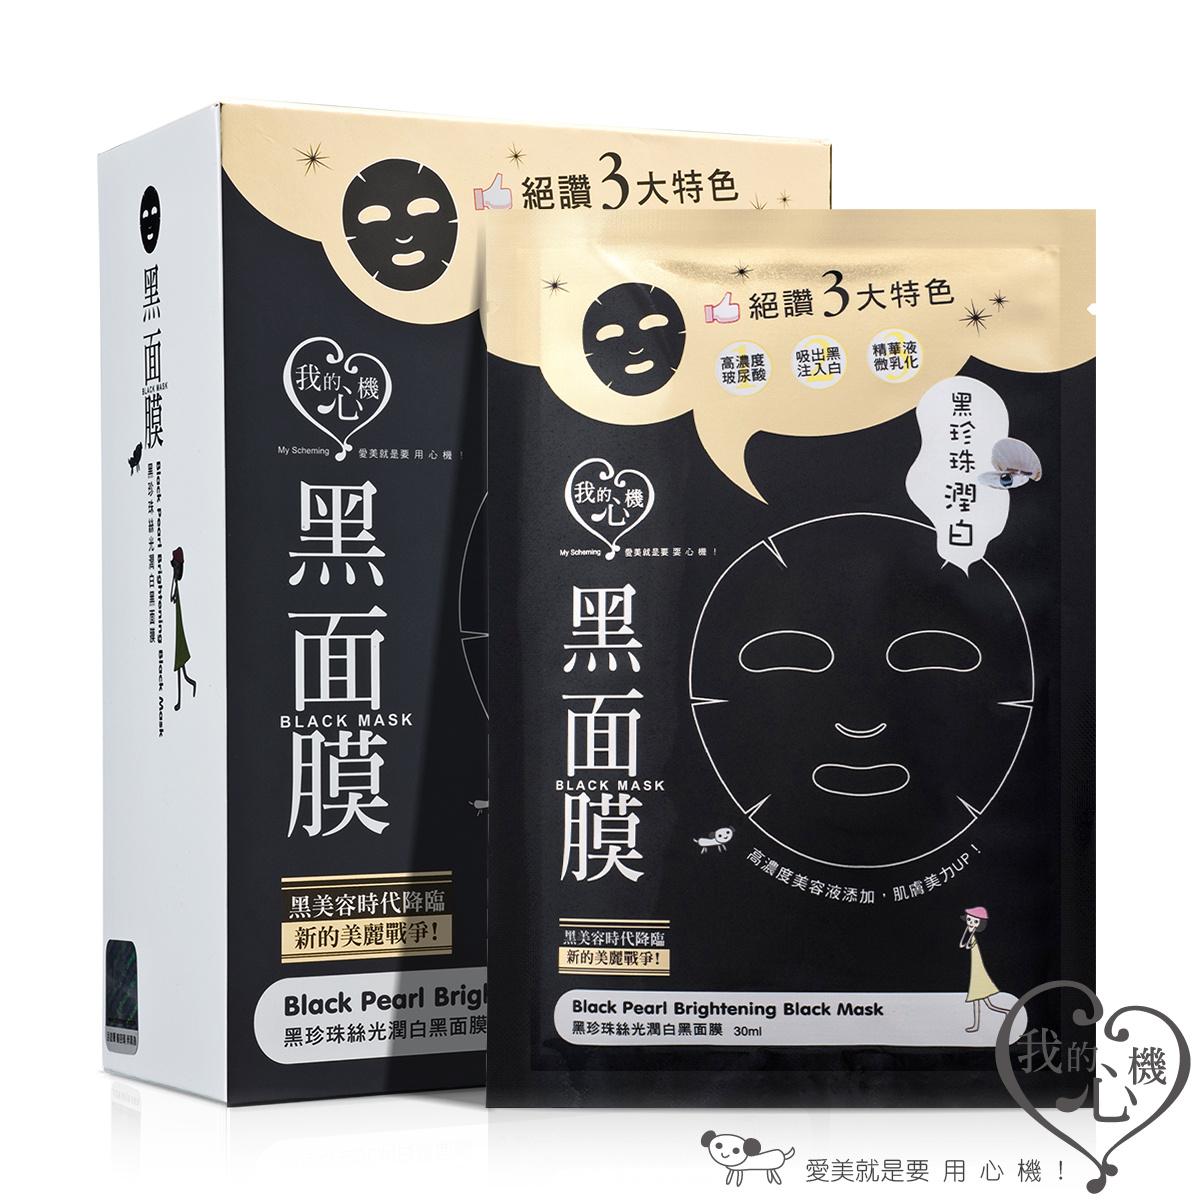 Black Pearl Brightening Black Mask (8 pcs)-1